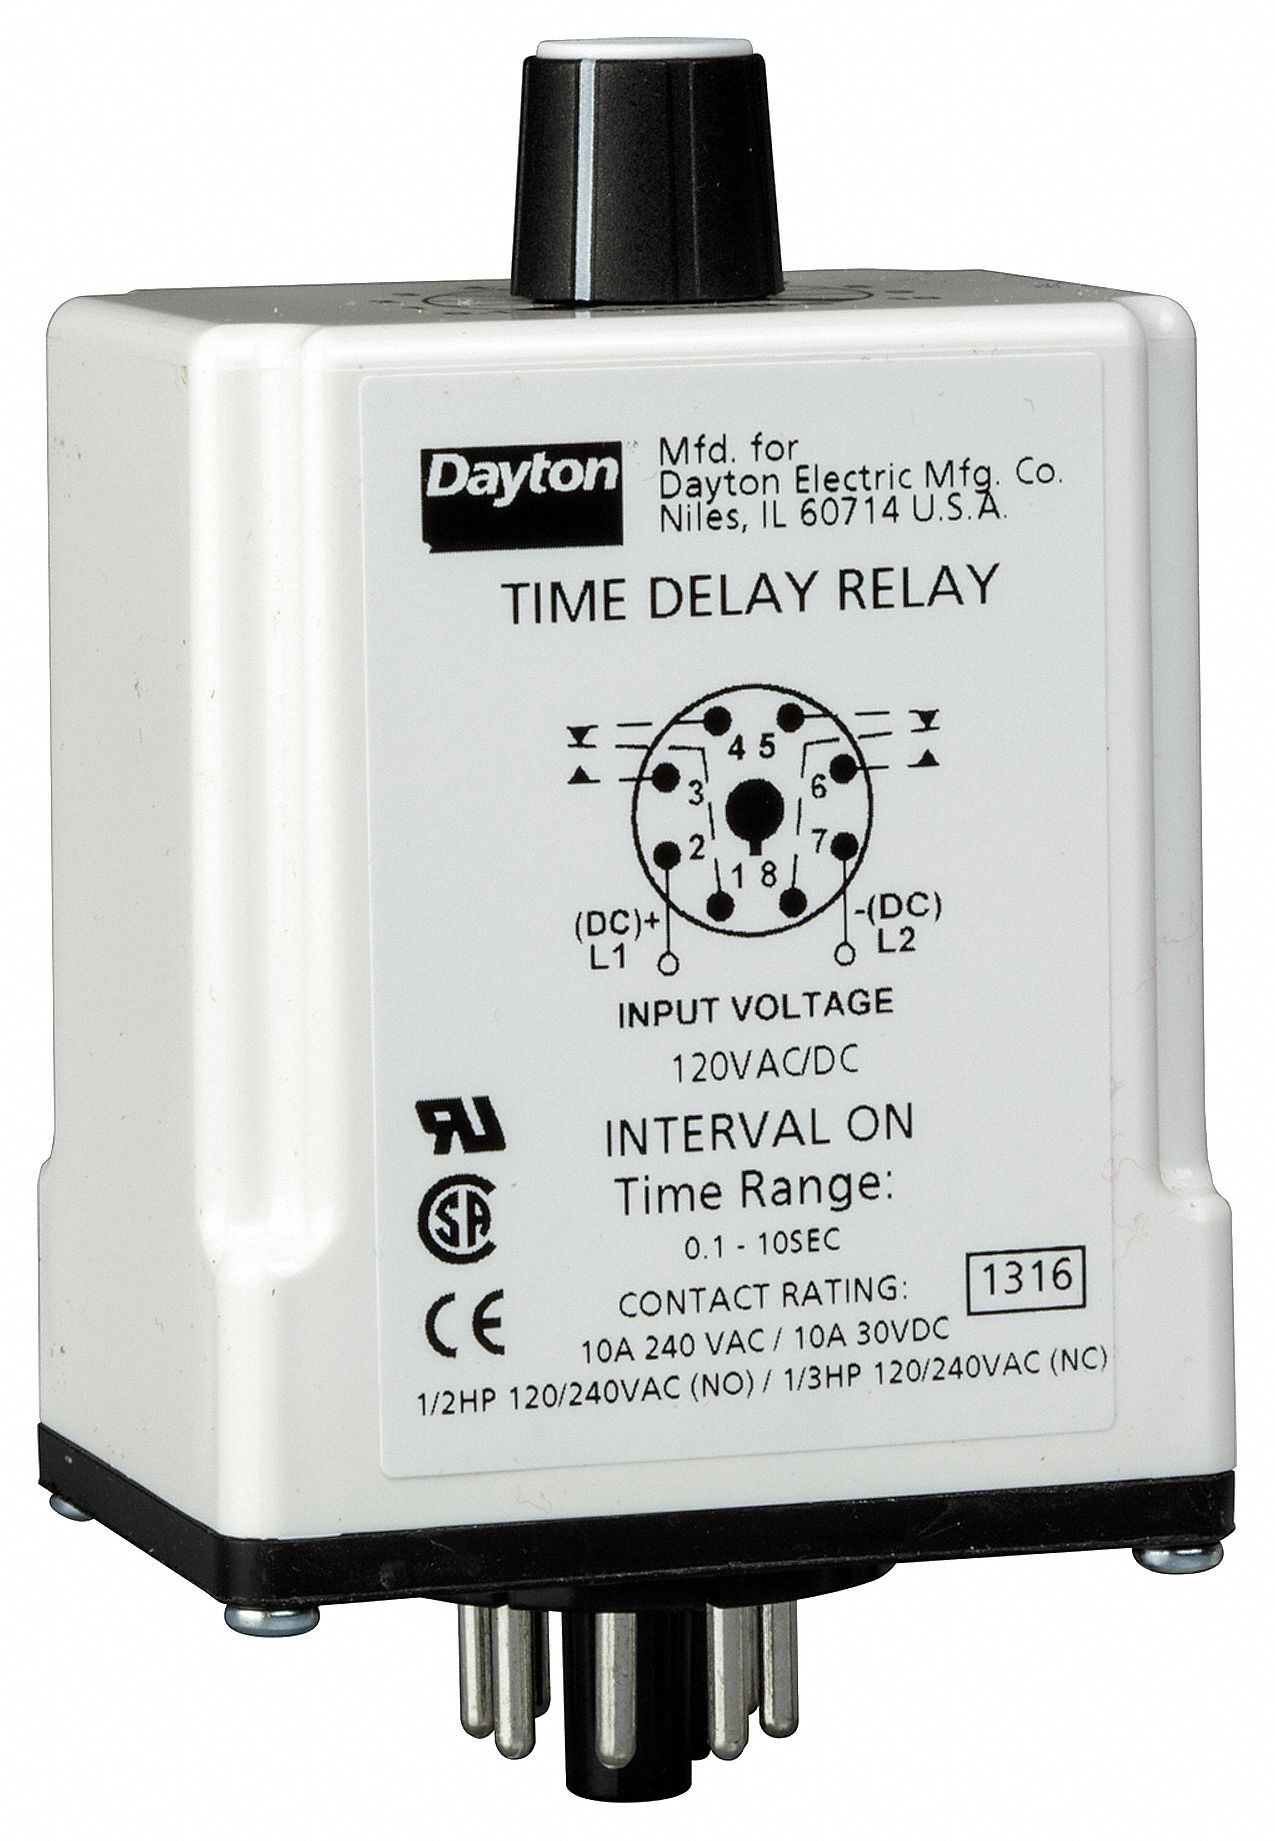 DAYTON Single Function Timing Relay, 120VAC/DC, 10A @ 240V, 8 Pins ...